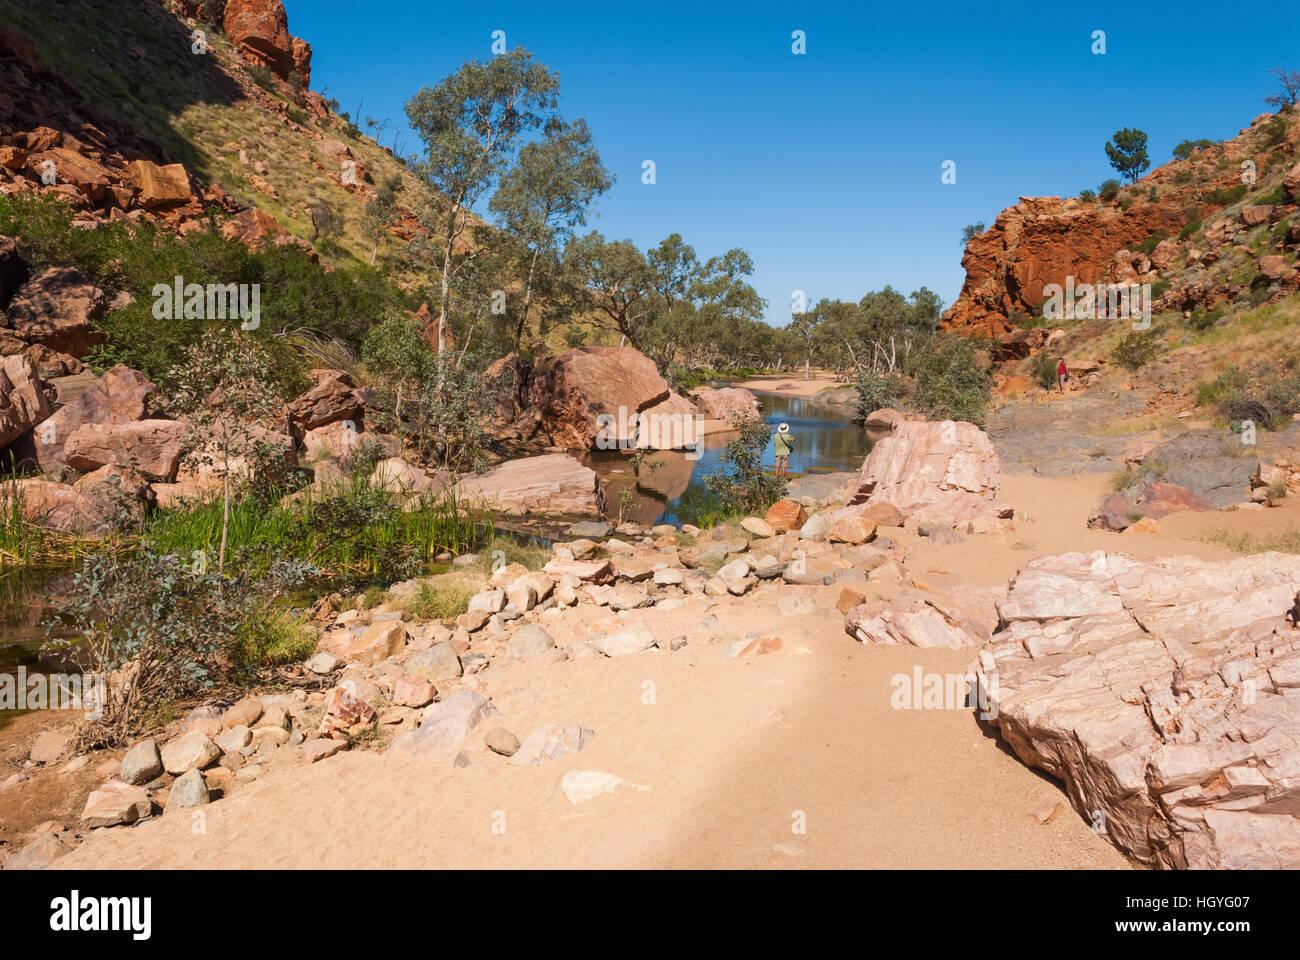 Simpsons Gap, MacDonnell Ranges, Australia - Stock Image